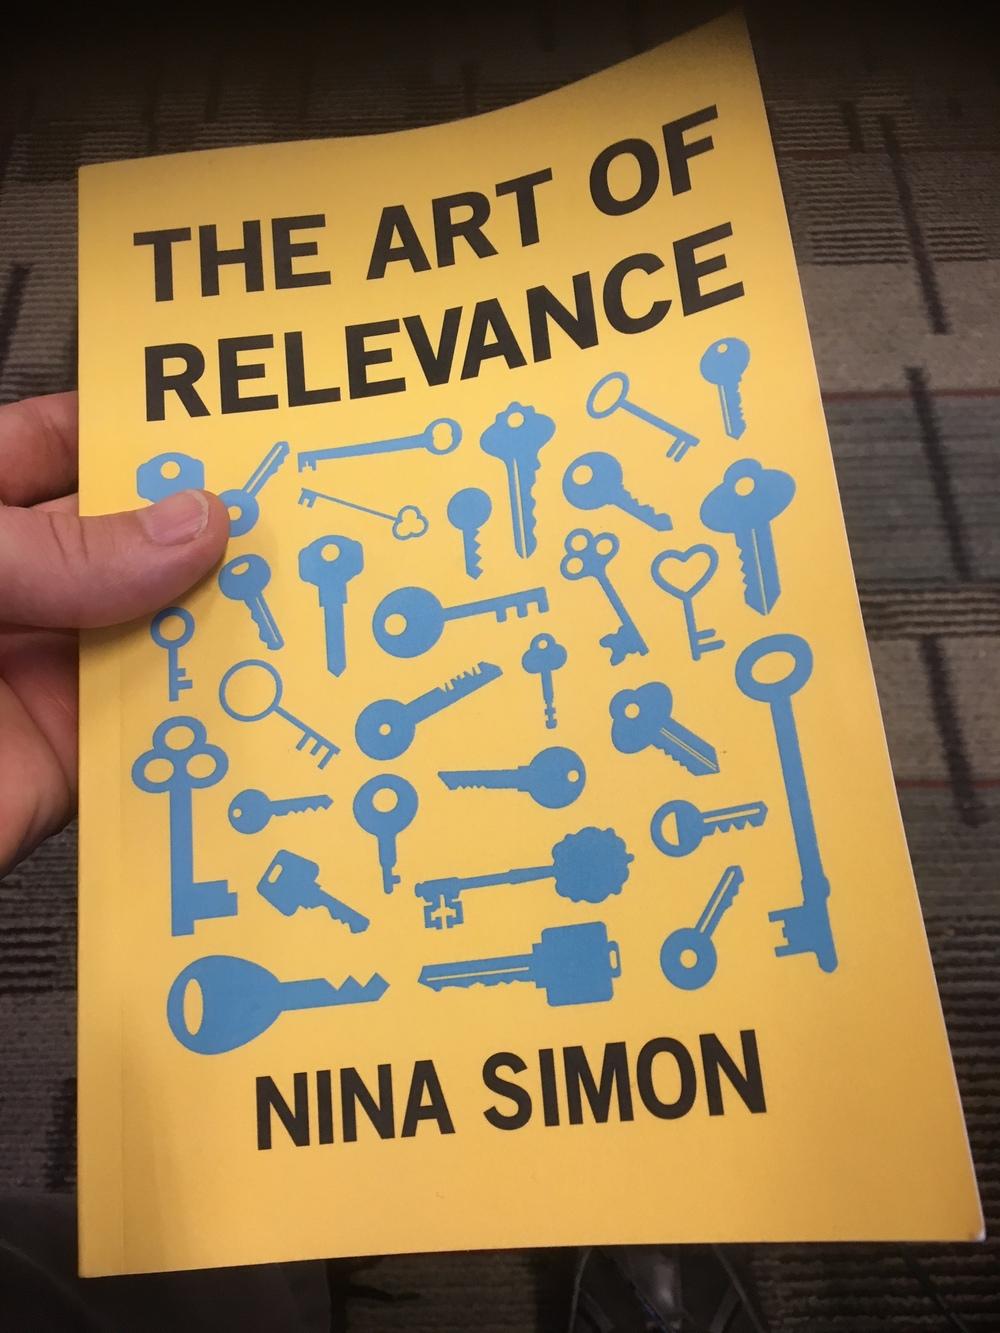 Nina Simon's The Art of Relevance